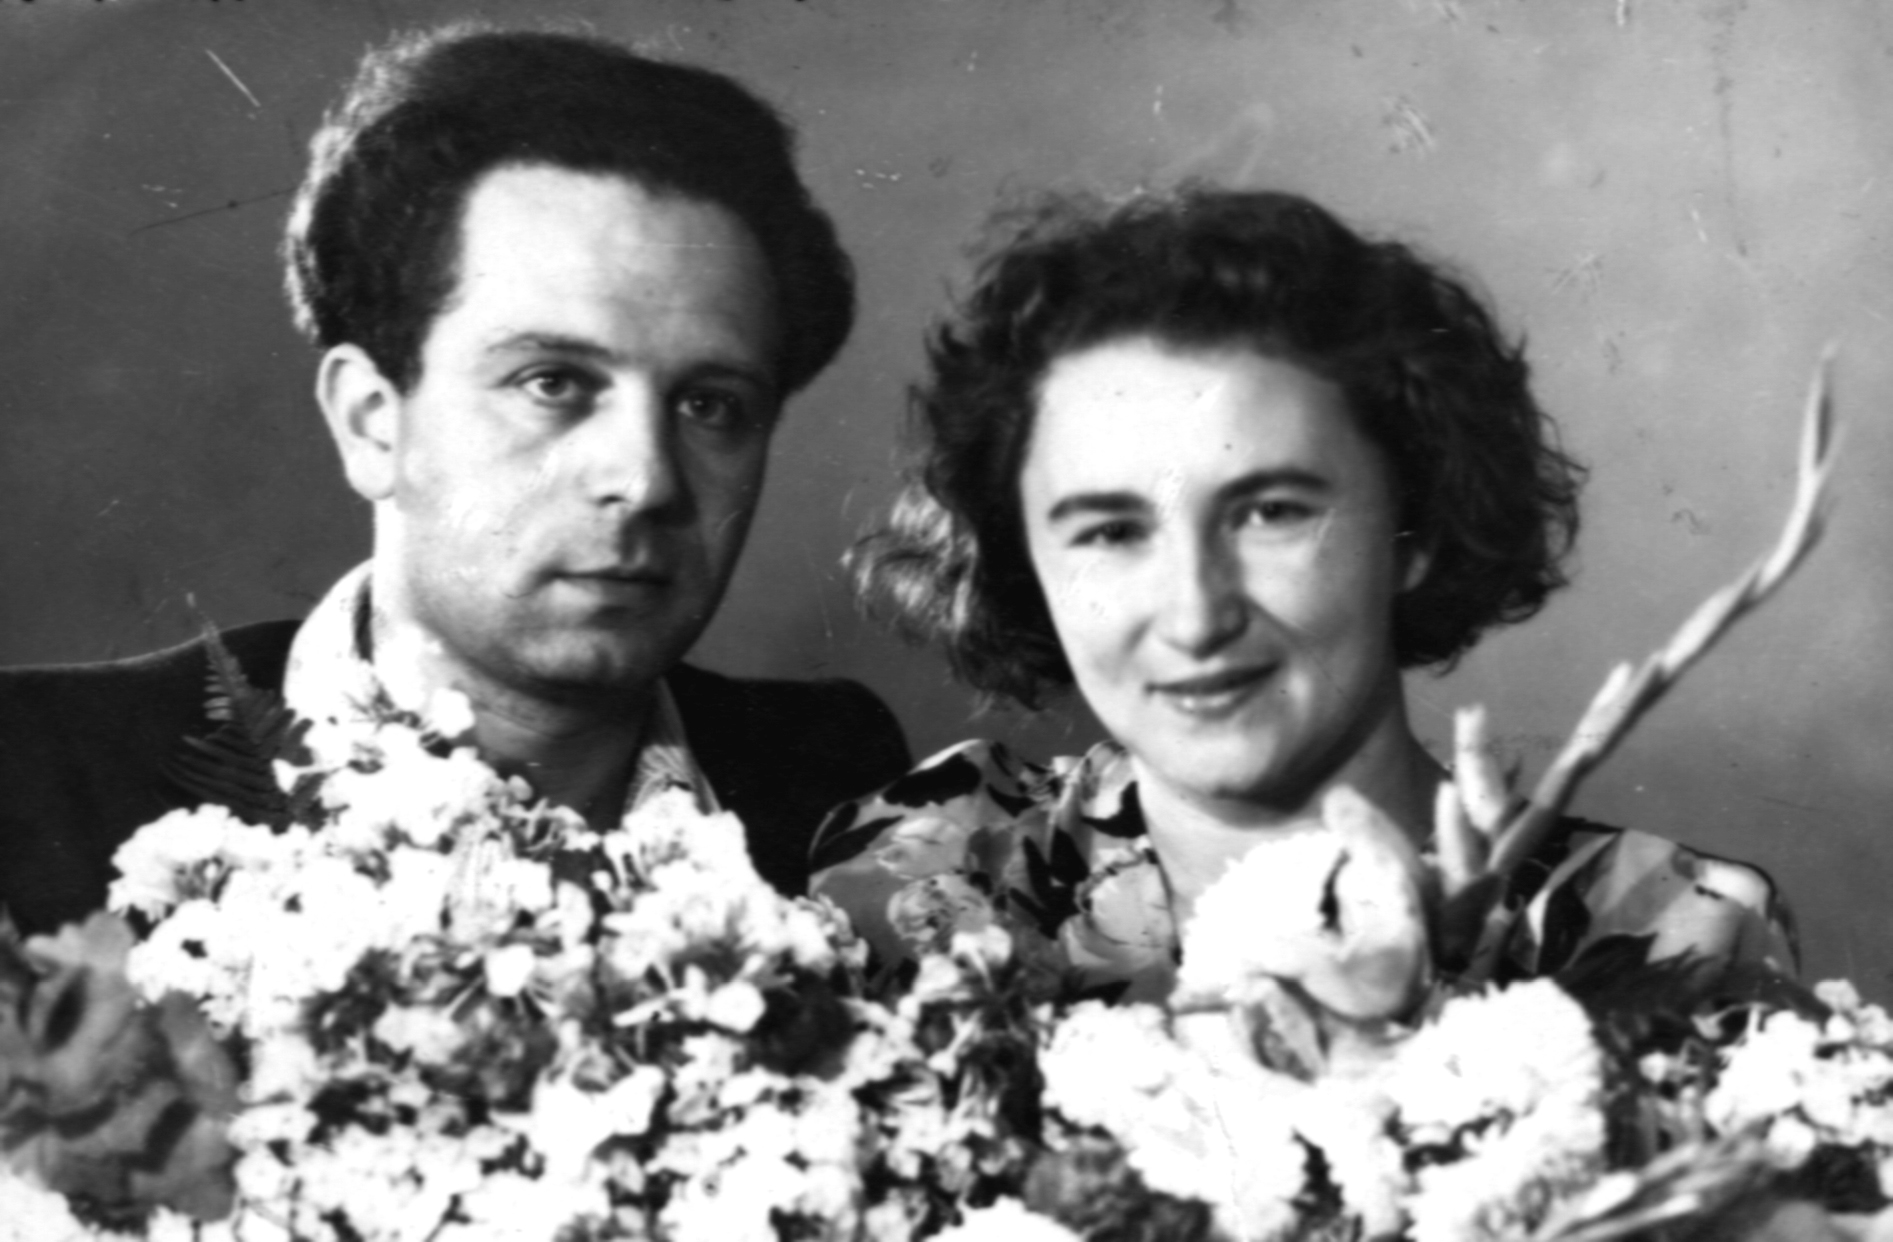 4.Свадьба Галины и Ефима.1952. Киев, Украина.